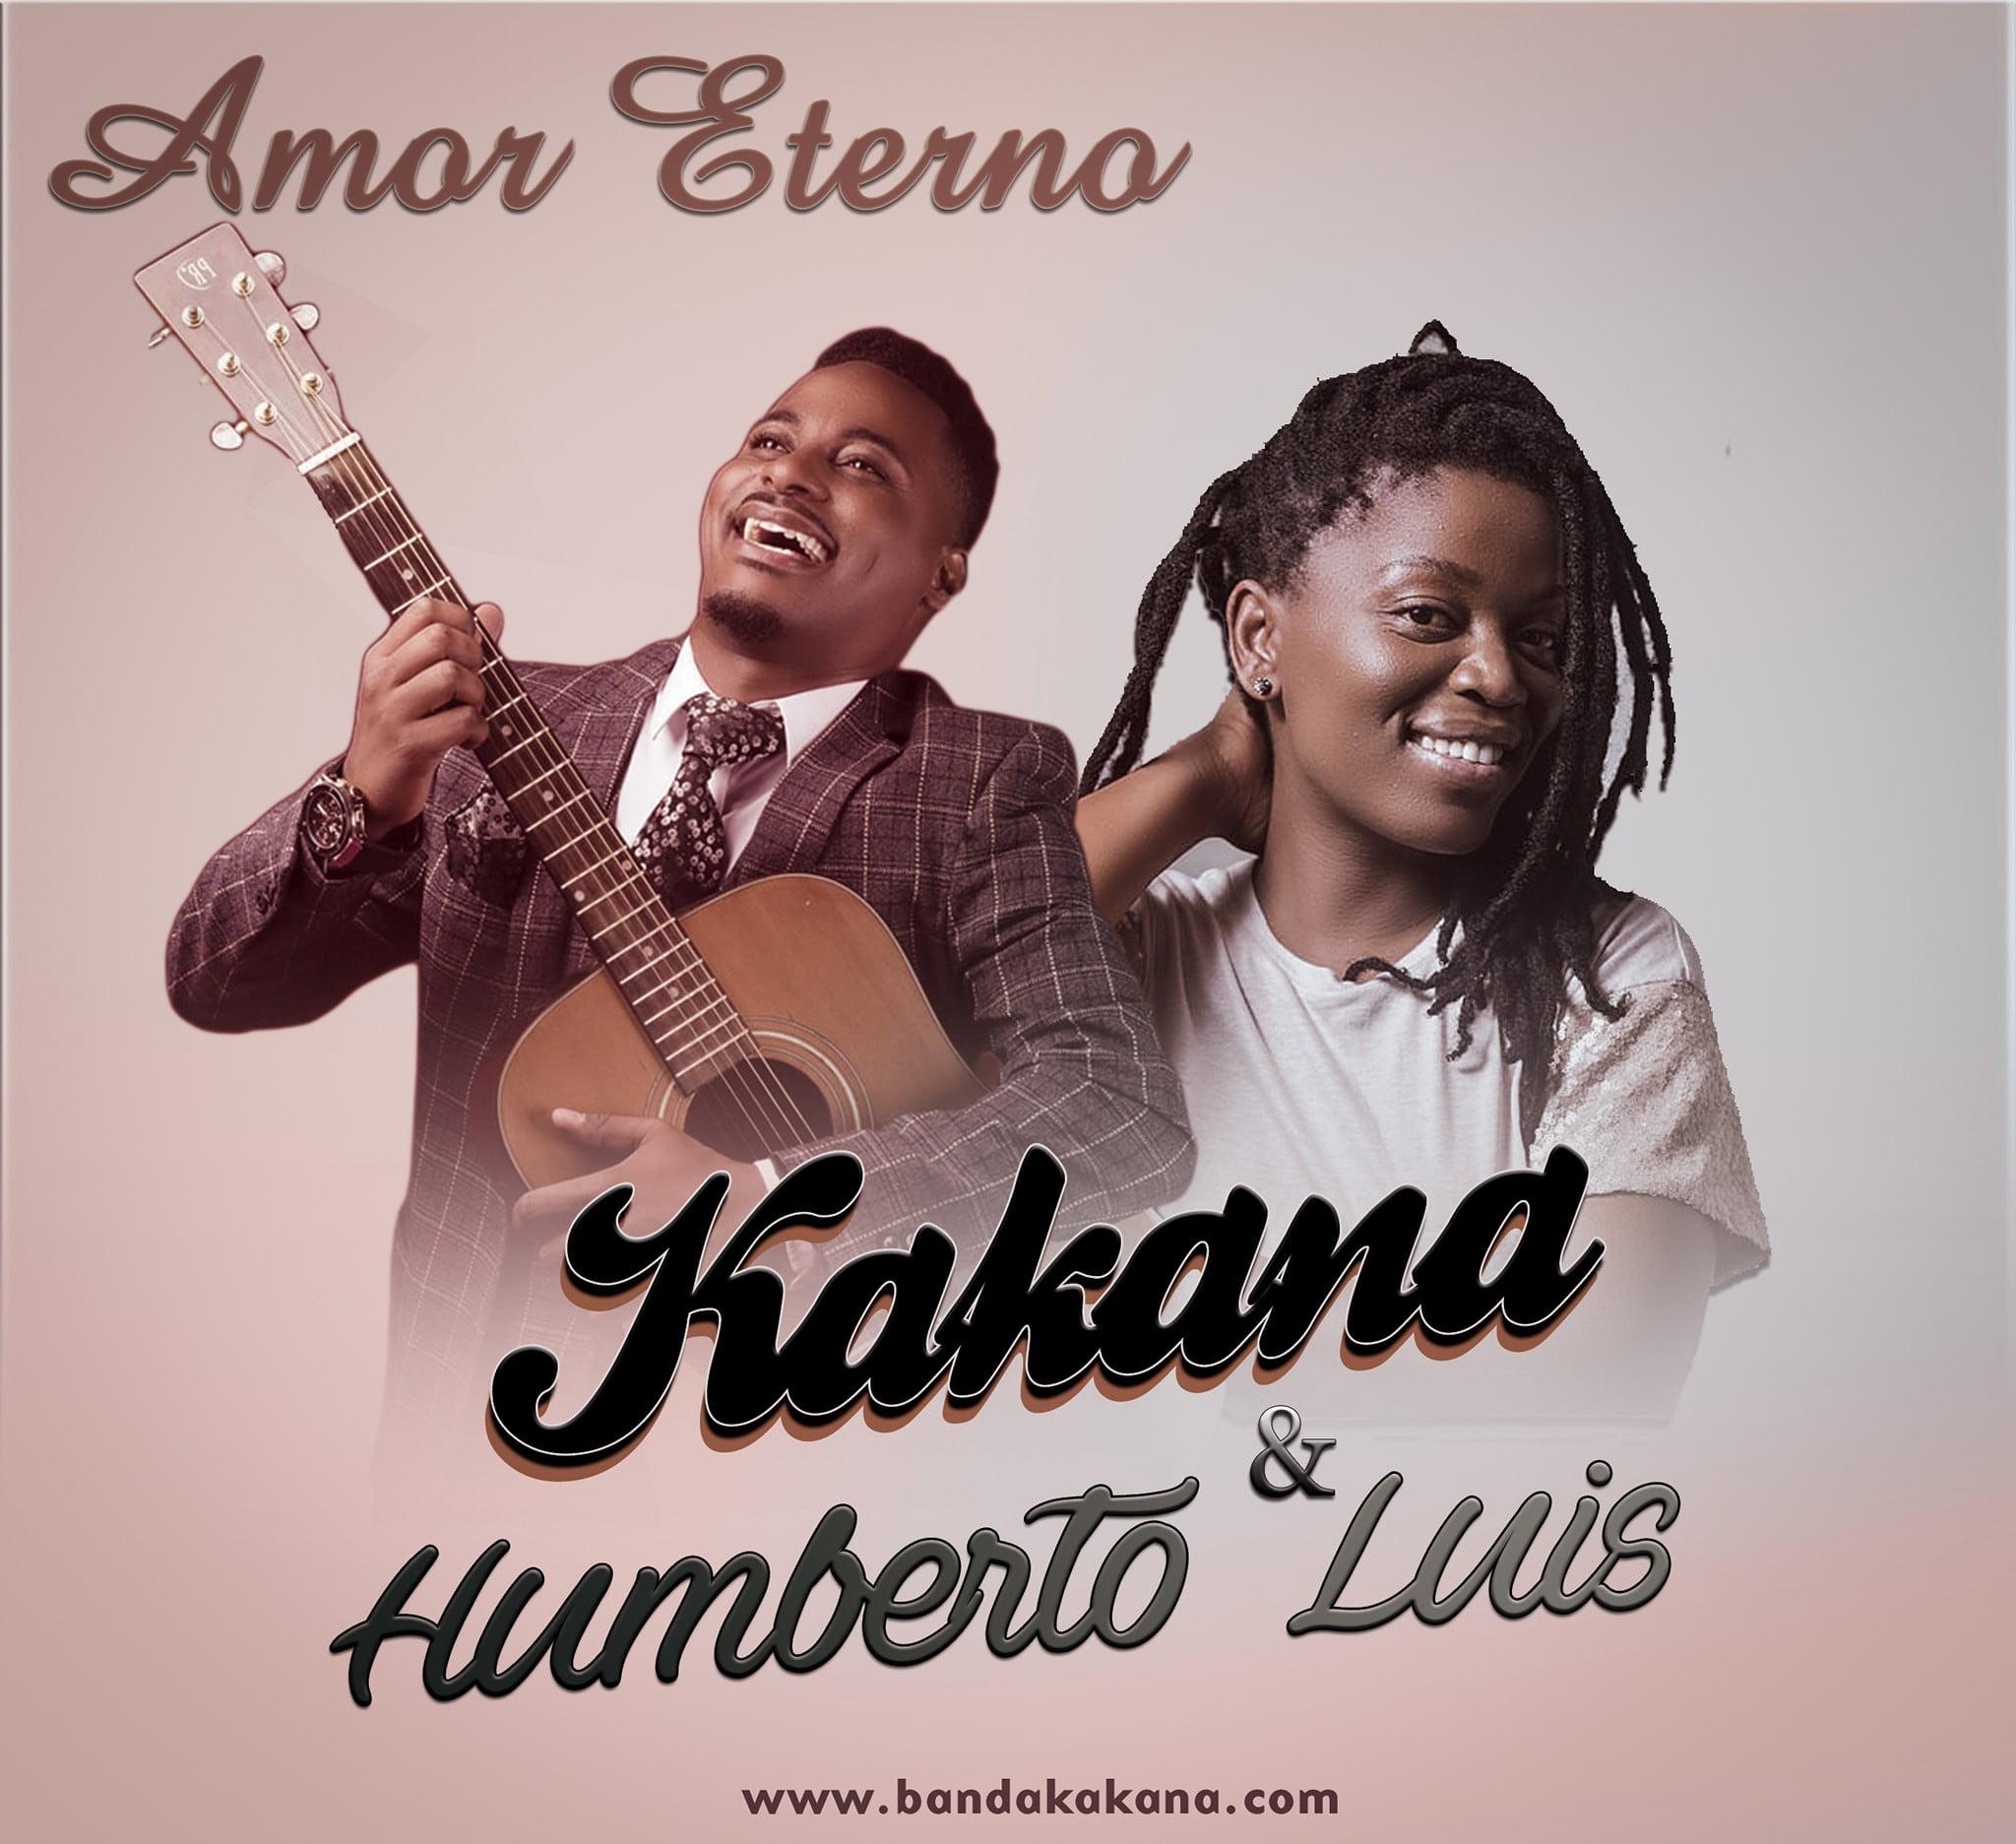 Kakana ft Humberto Luis - Amor Eterno